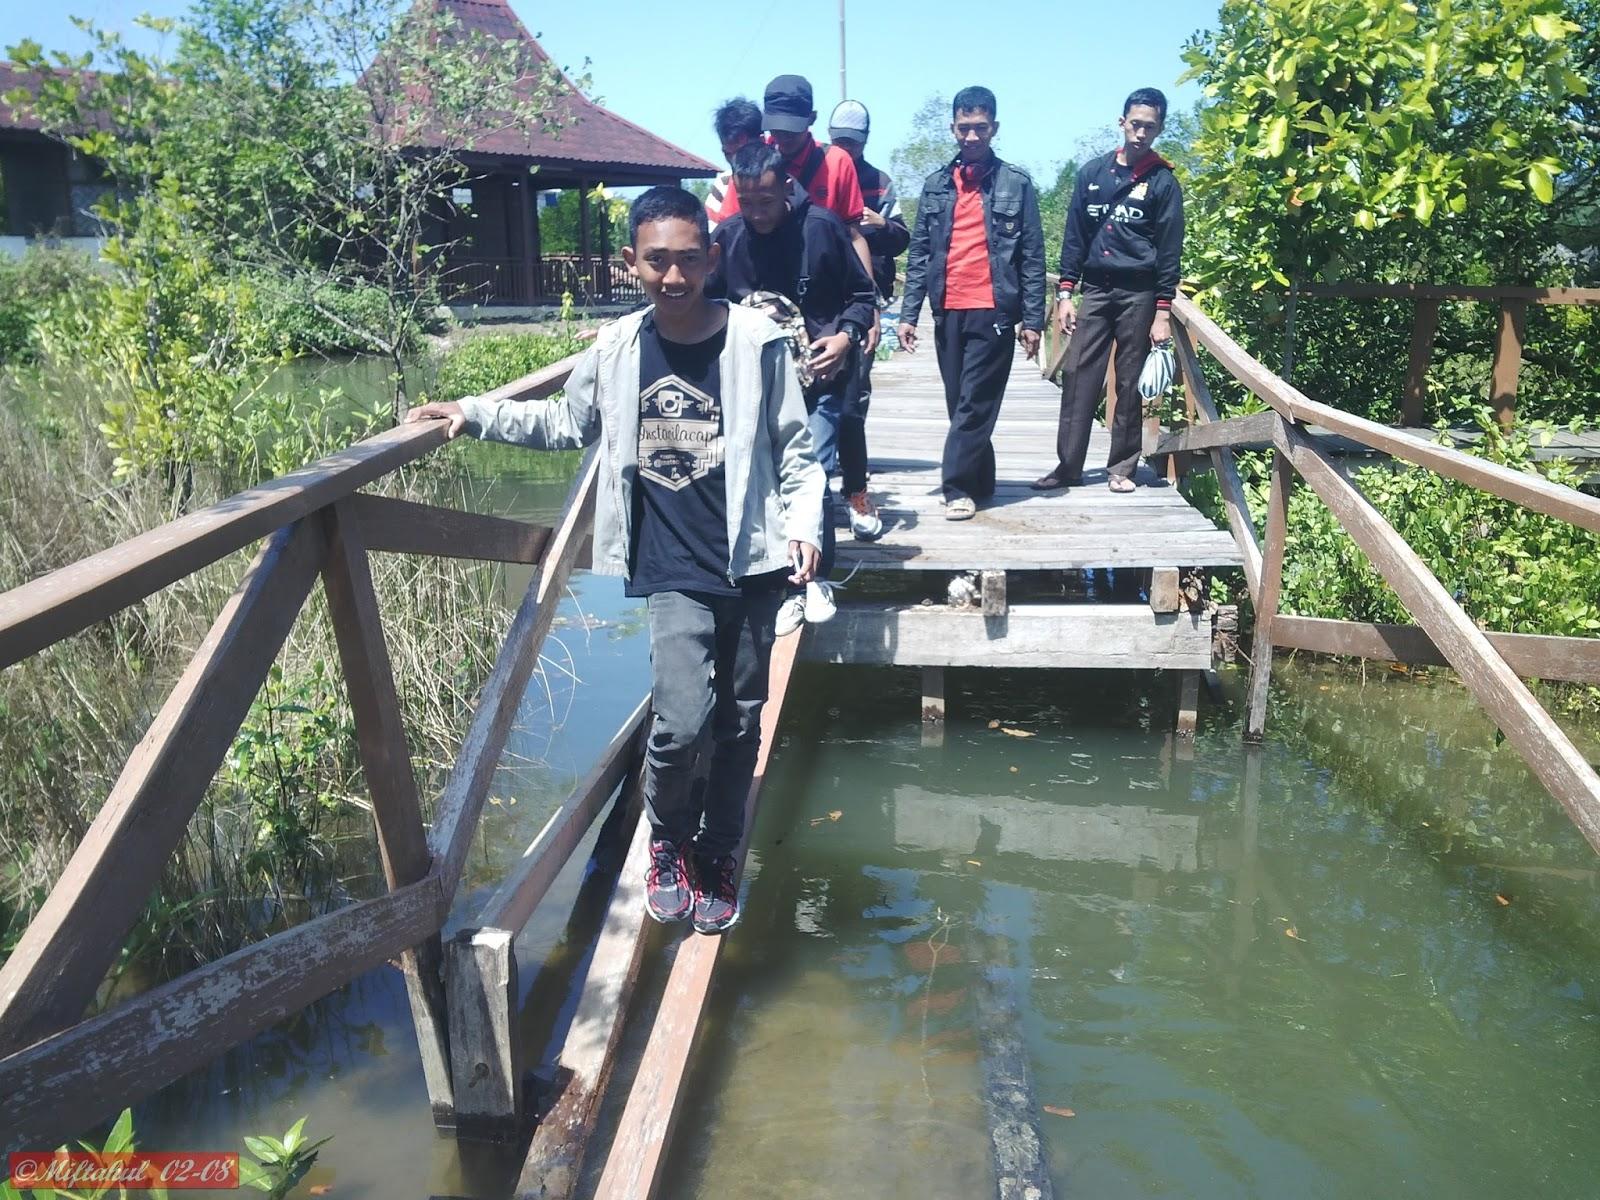 Wisata Cilacap Hutan Mangrove Kampung Laut Kayanya Udah Ngga Dirawat